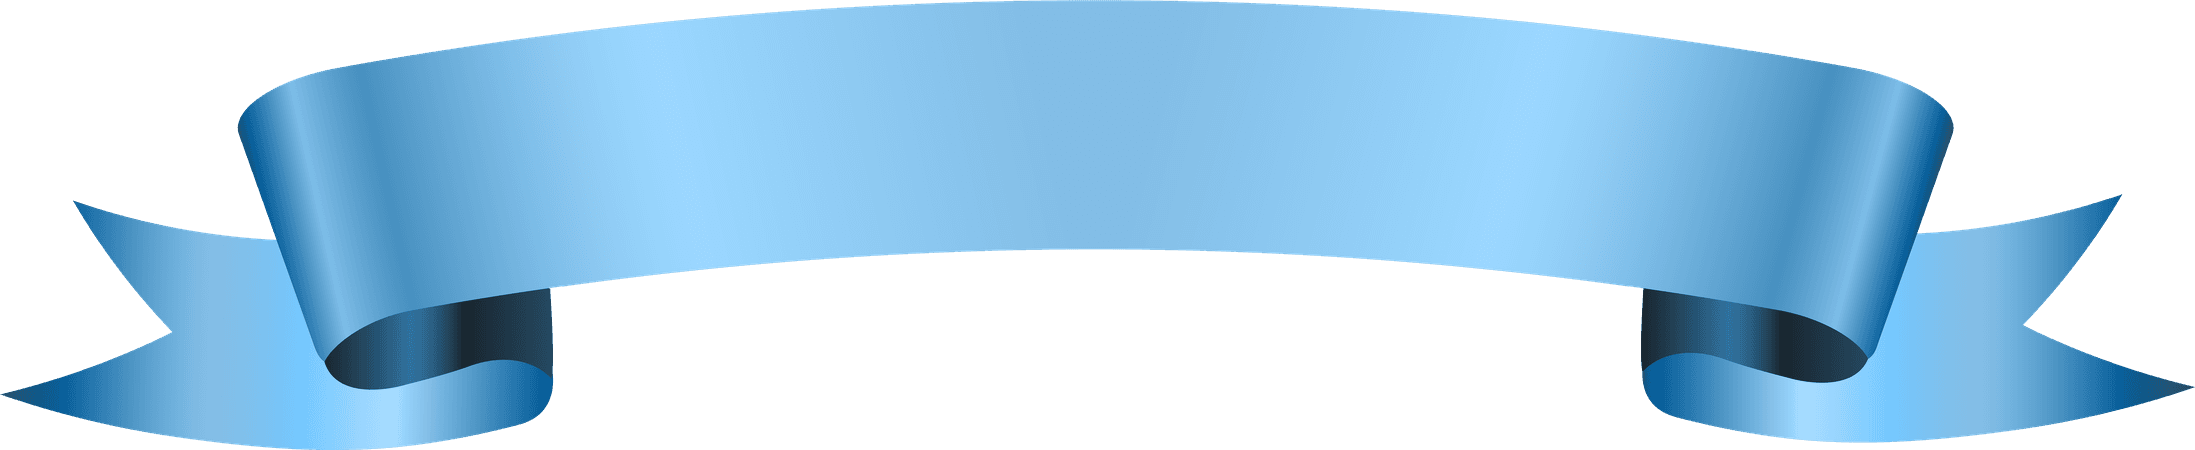 19-197866_blue-ribbon-png.png 7,937×1,627 pixels